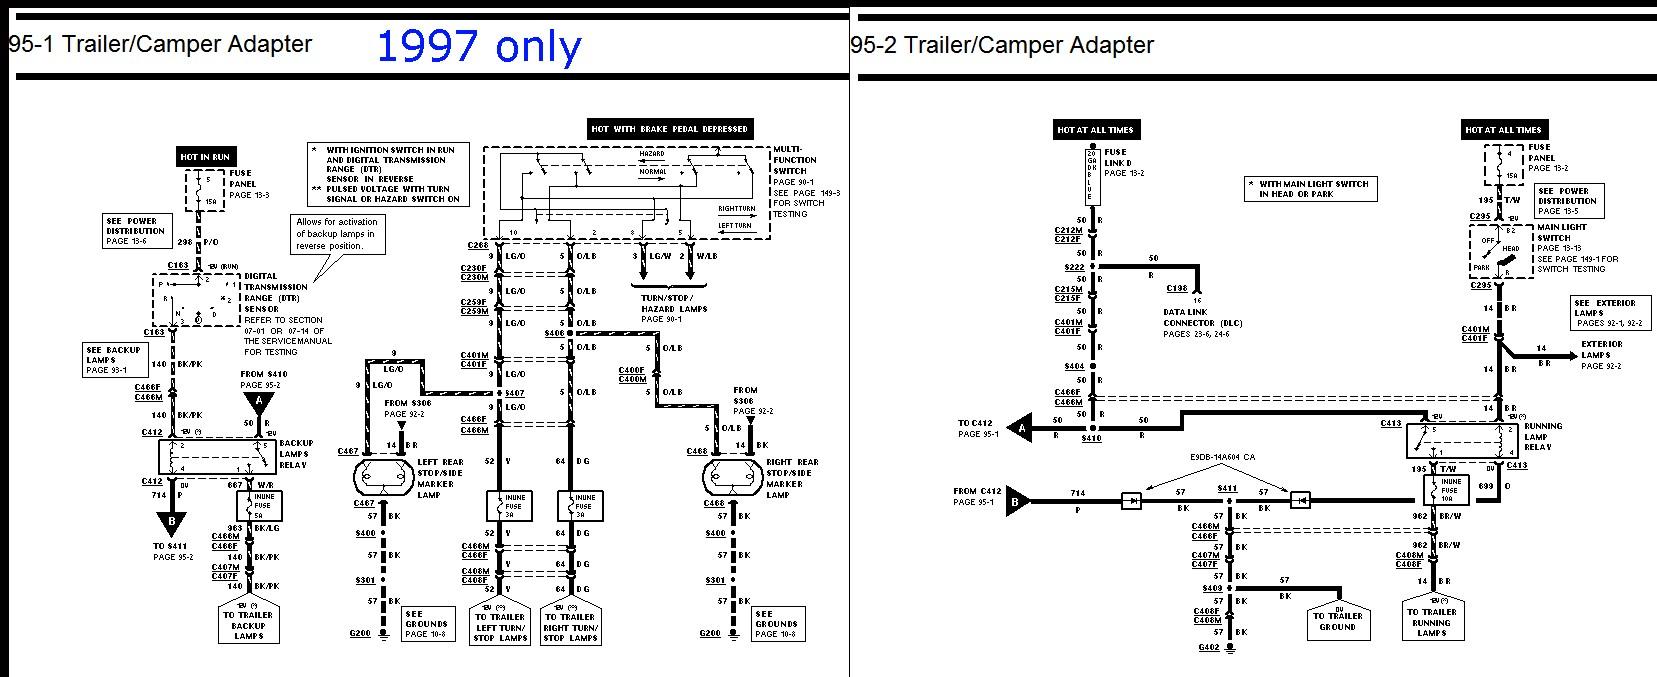 1997 ford f150 wiring diagram wiring diagram image rh mainetreasurechest  com 1997 ford f150 radio wiring diagram 1997 ford f150 electrical diagram